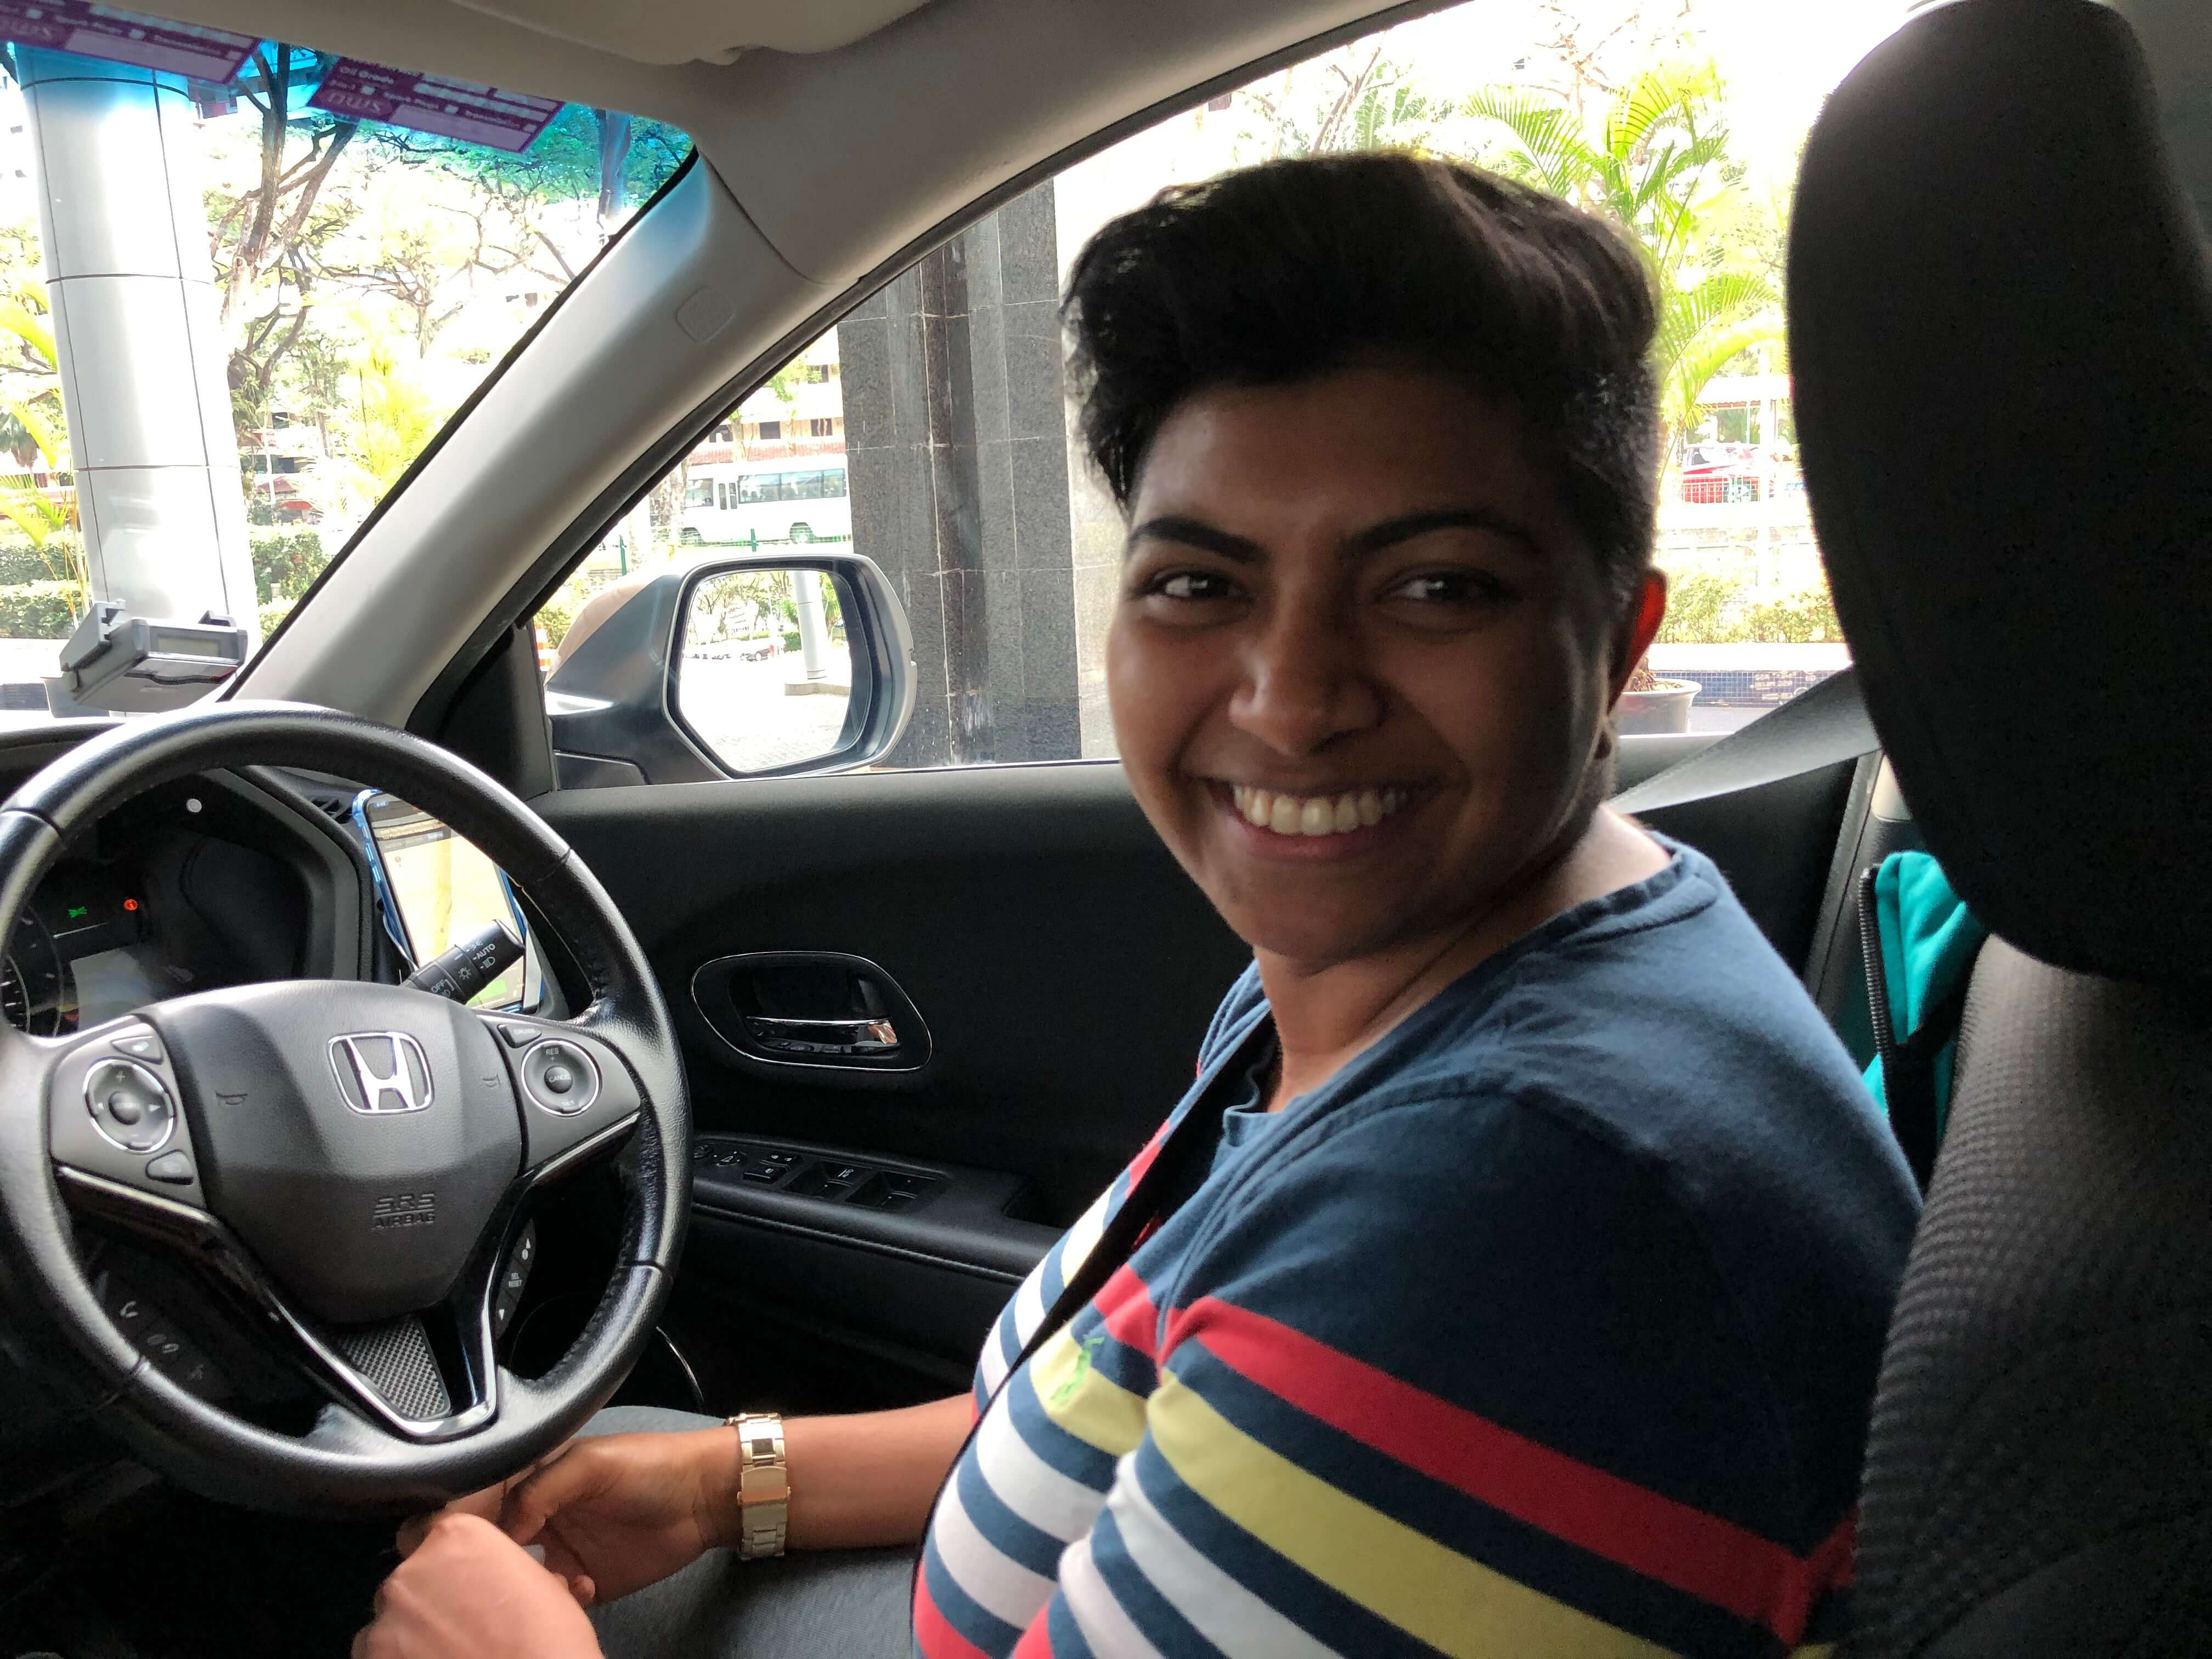 Grab driver-partner Suhanti Thangarajoo